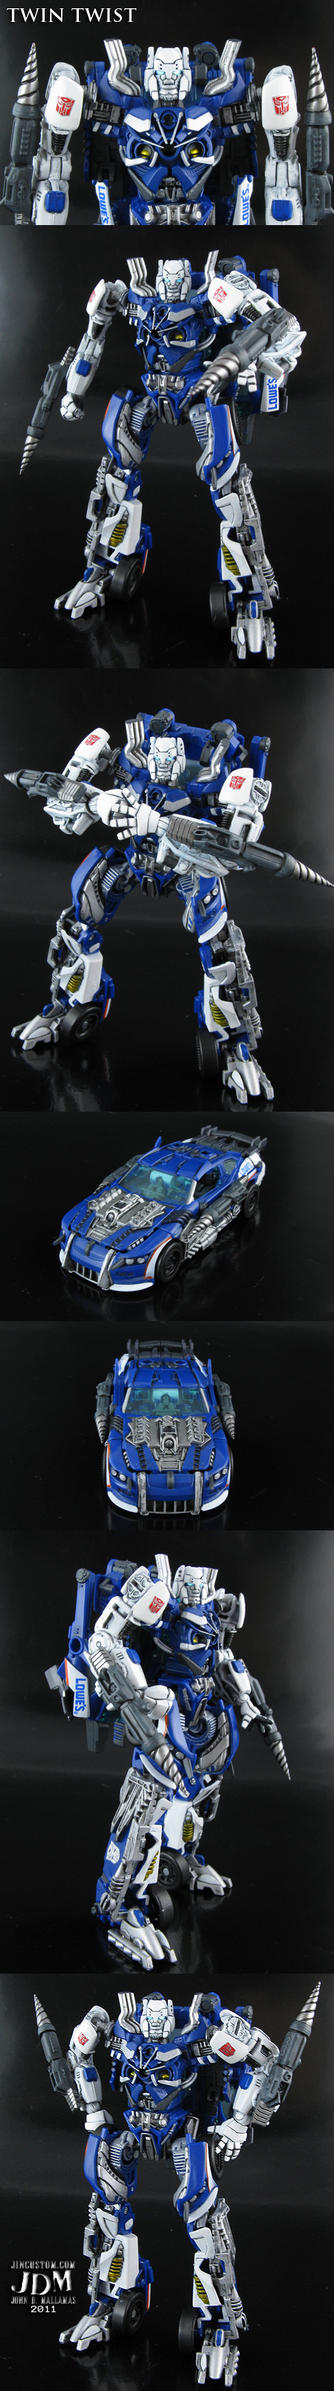 Transformers Twin Twist by Jin-Saotome